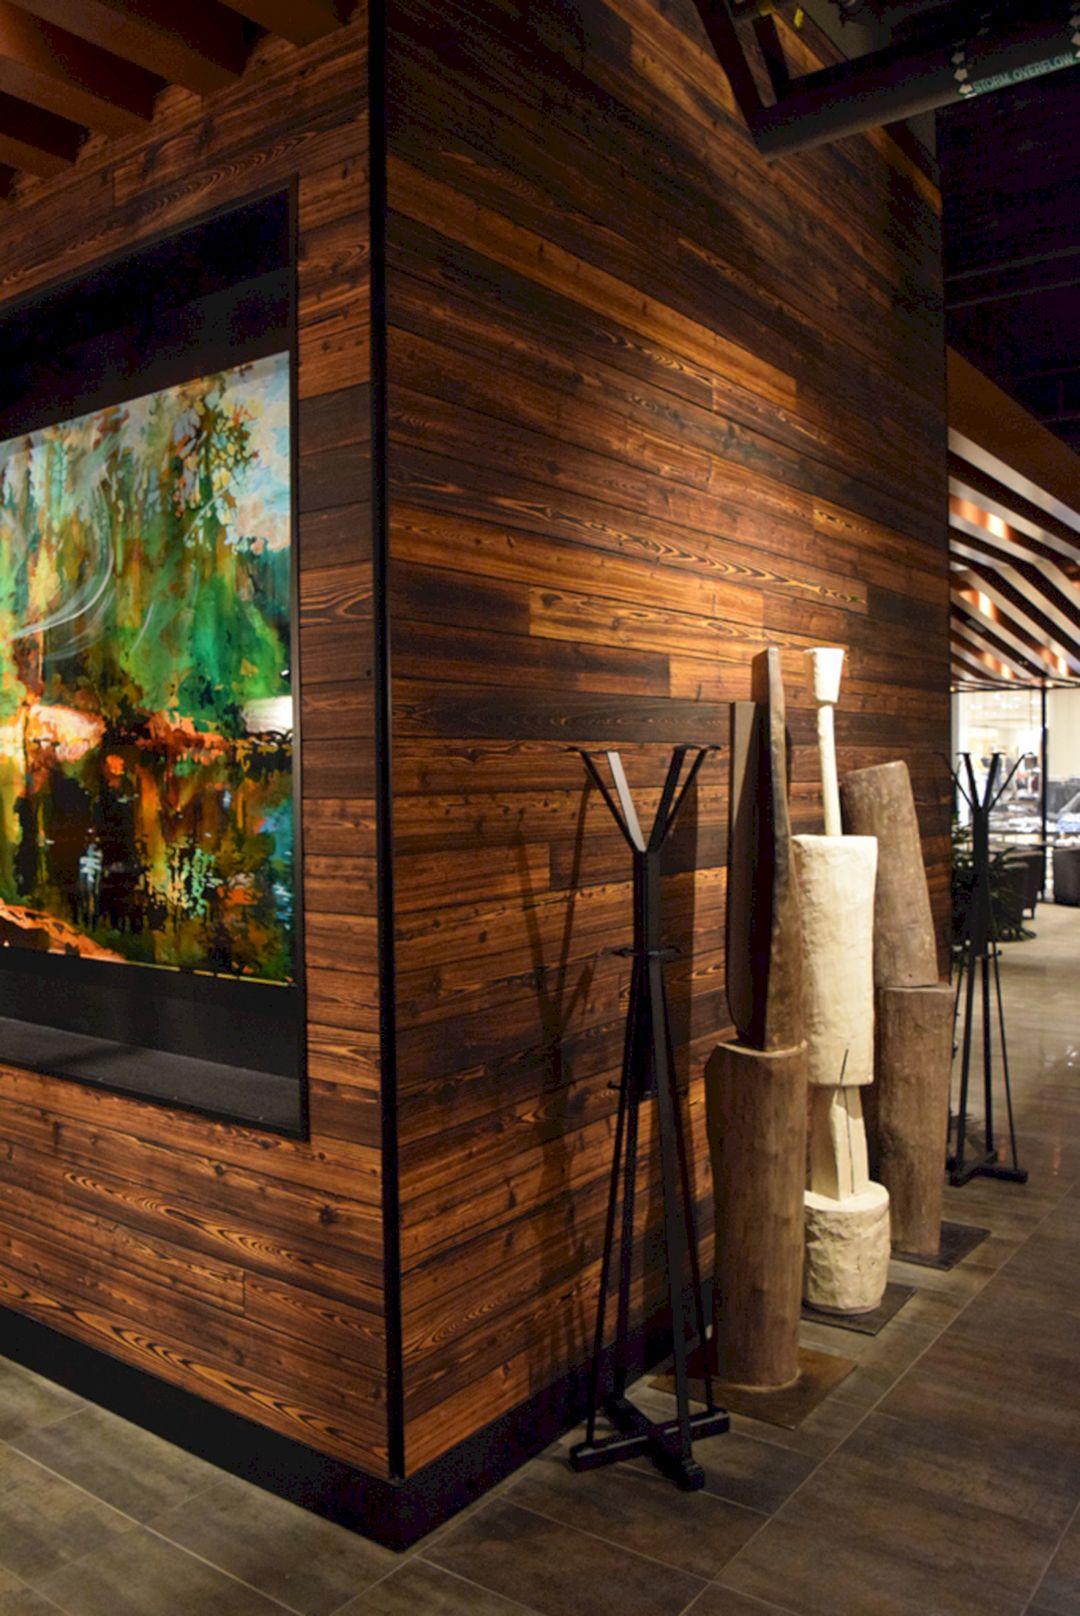 New York Interior Design Inc